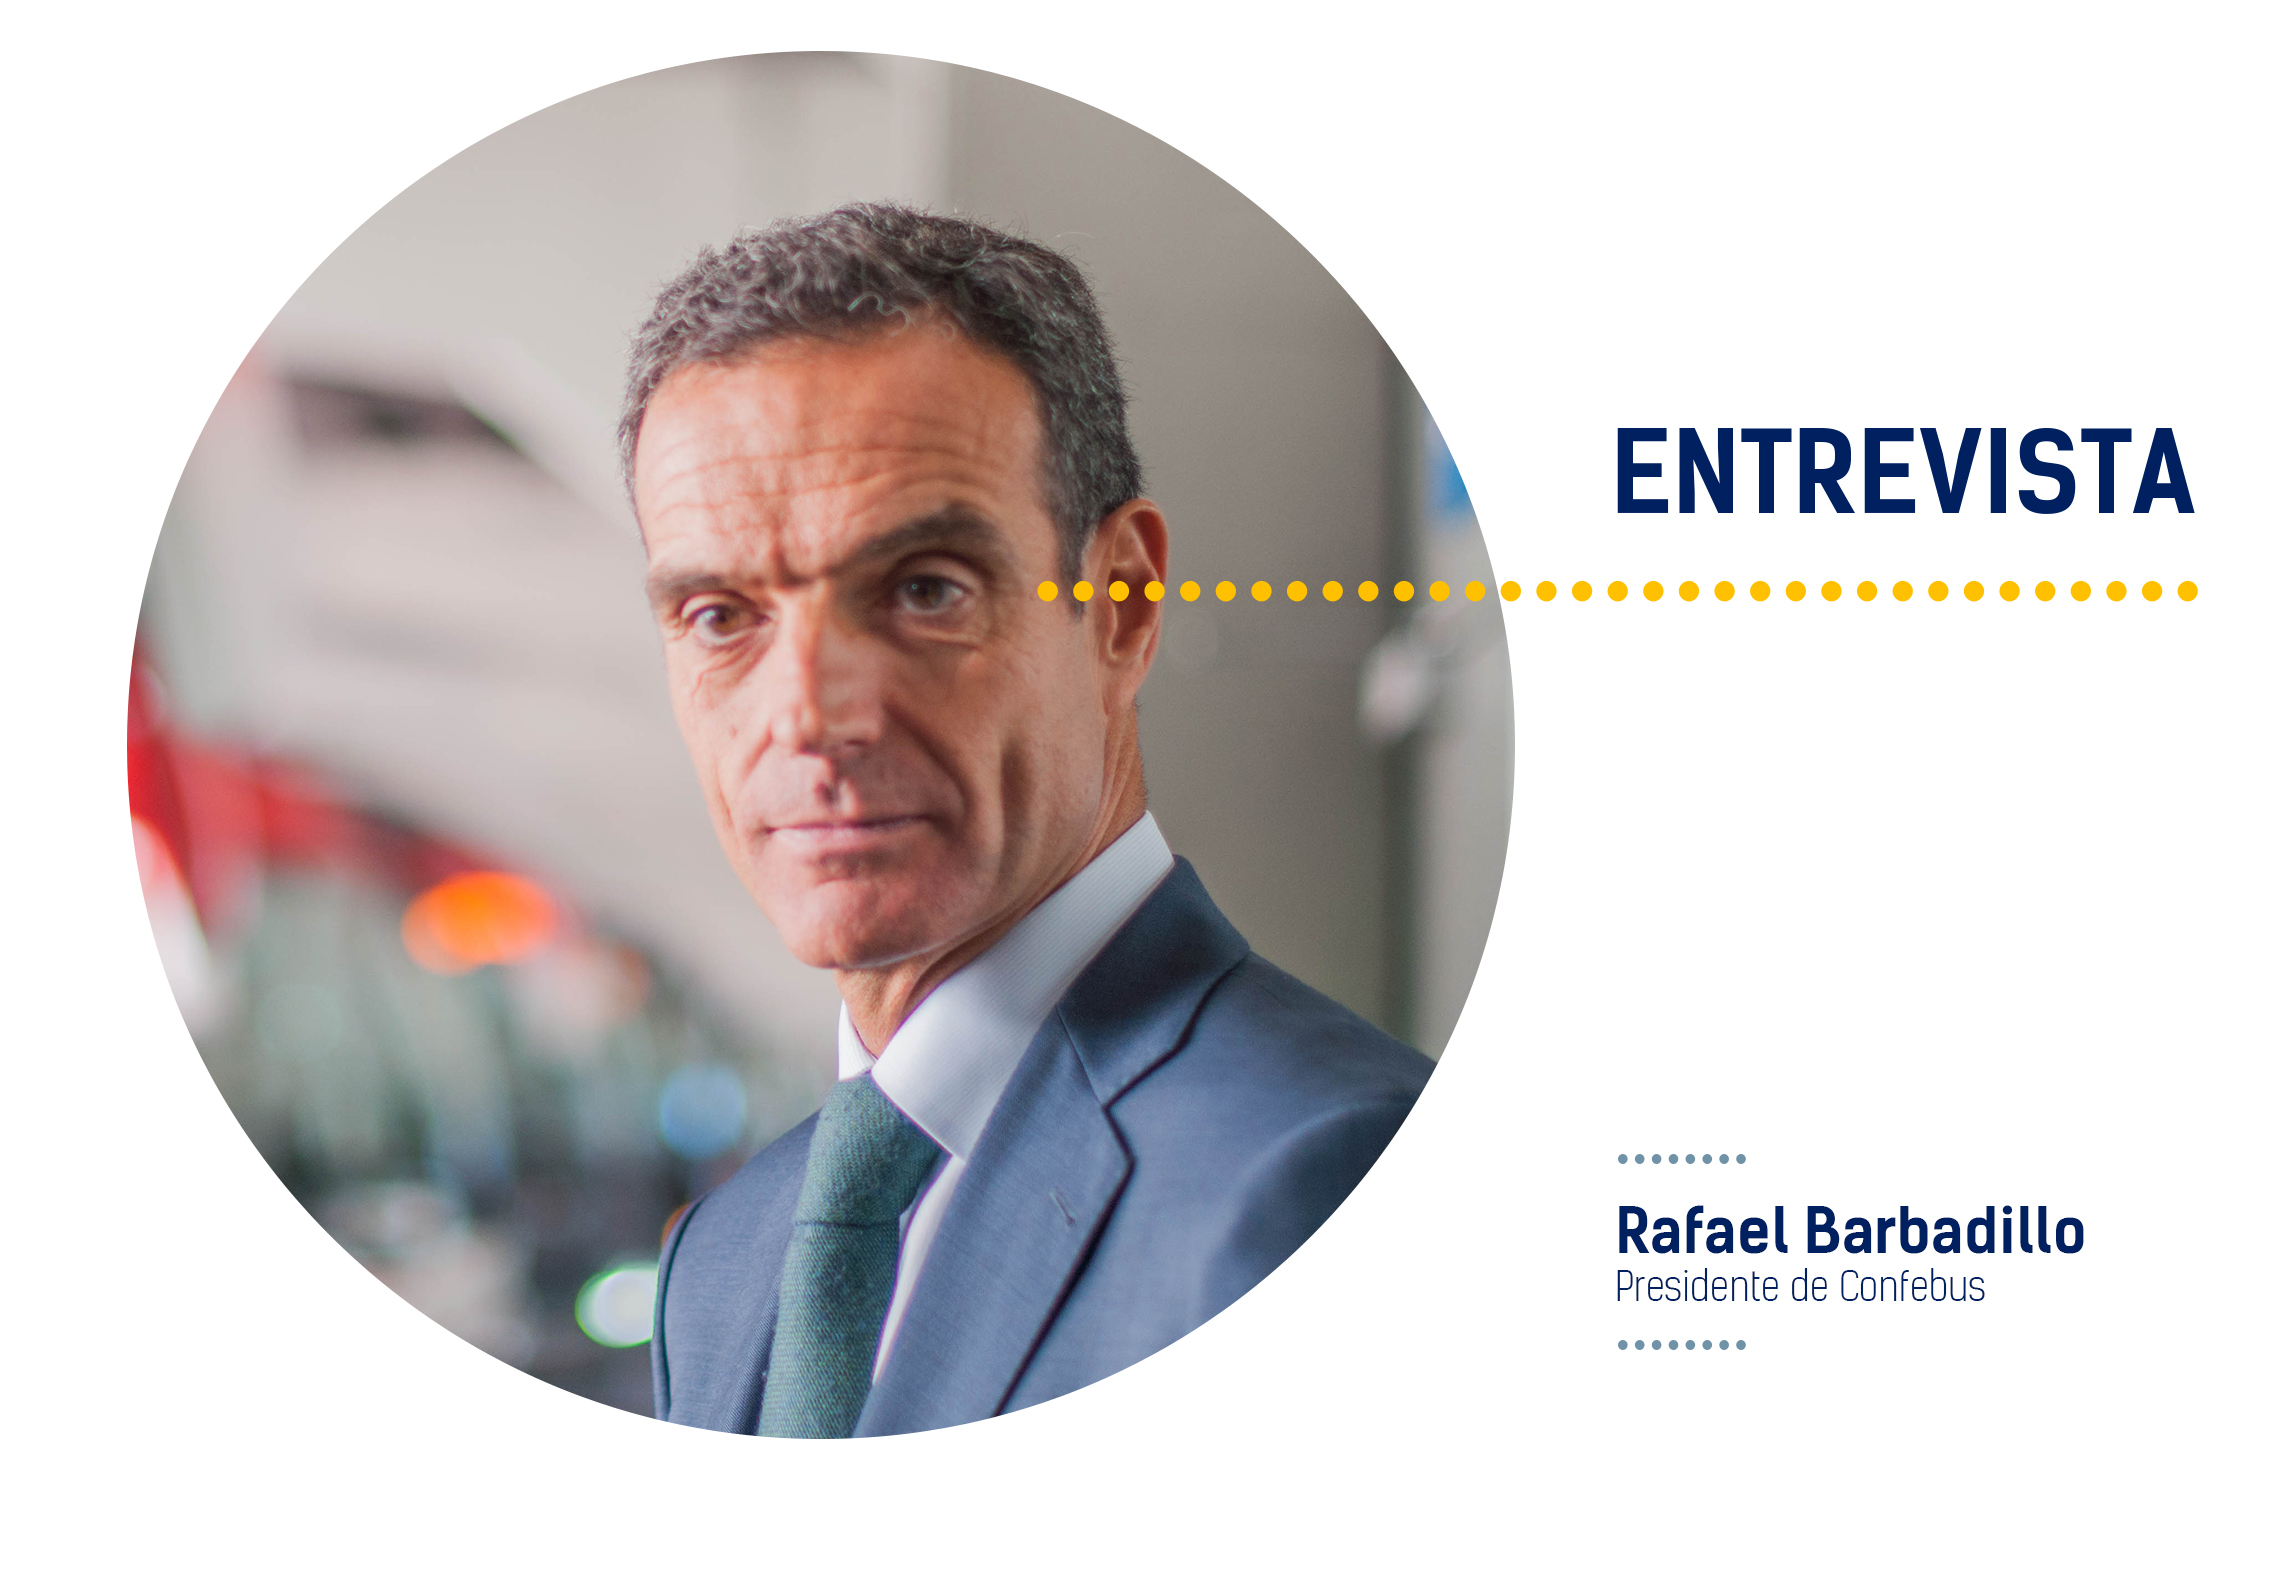 Entrevista Rafael Barbadillo